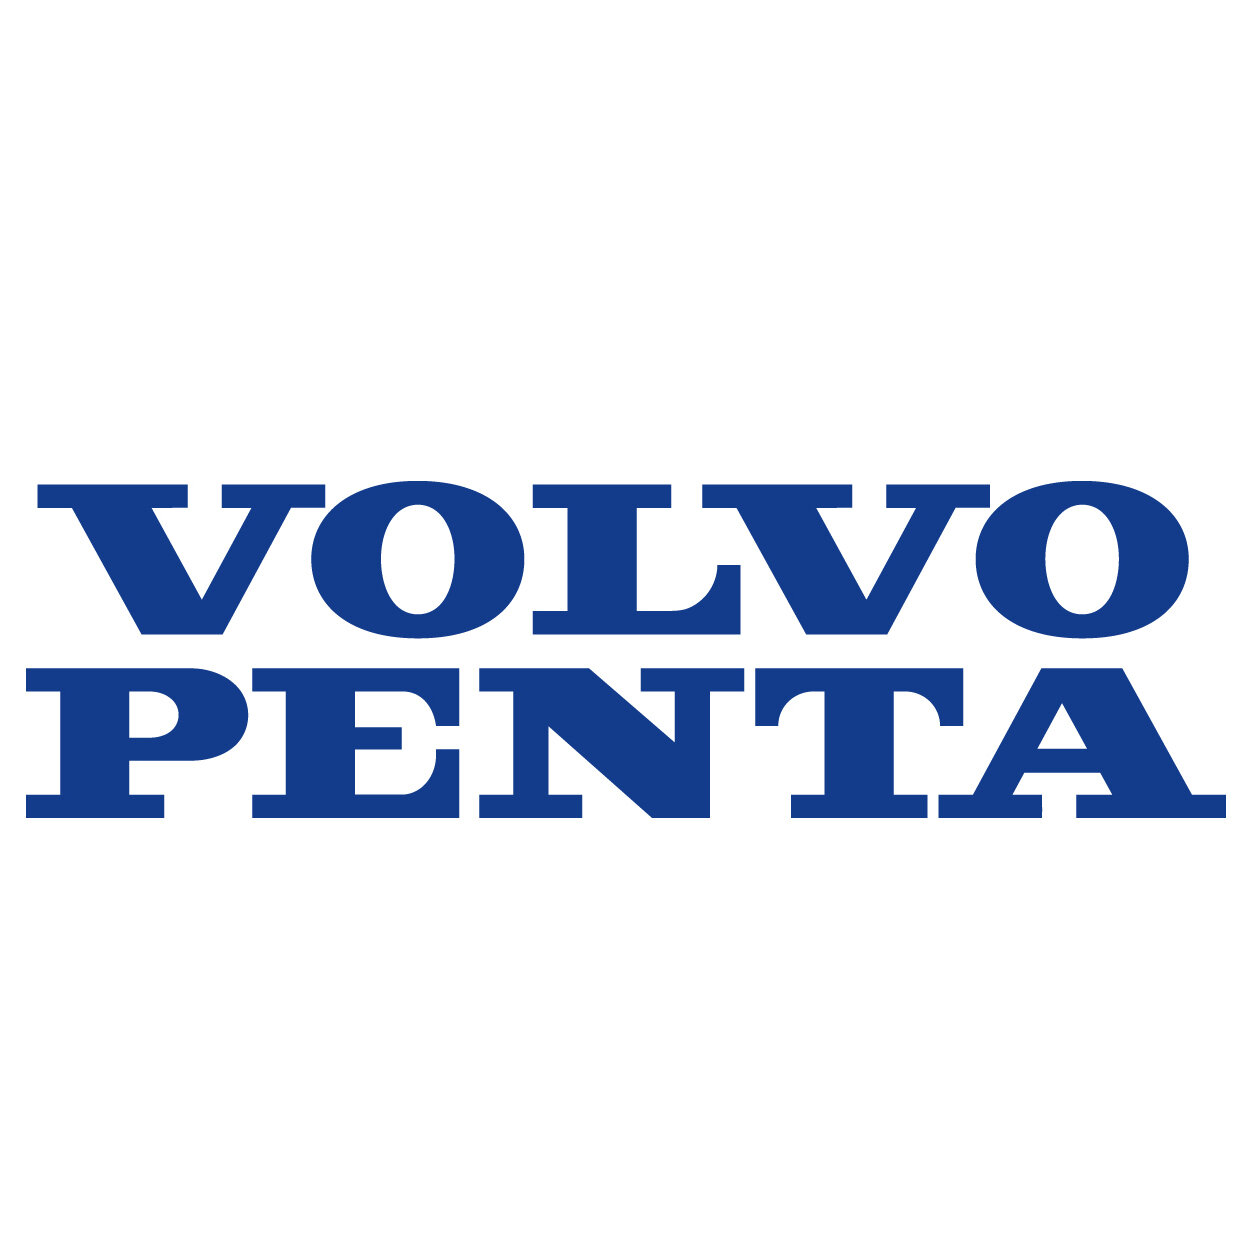 Volvo_Penta_stacked_RGB.jpg